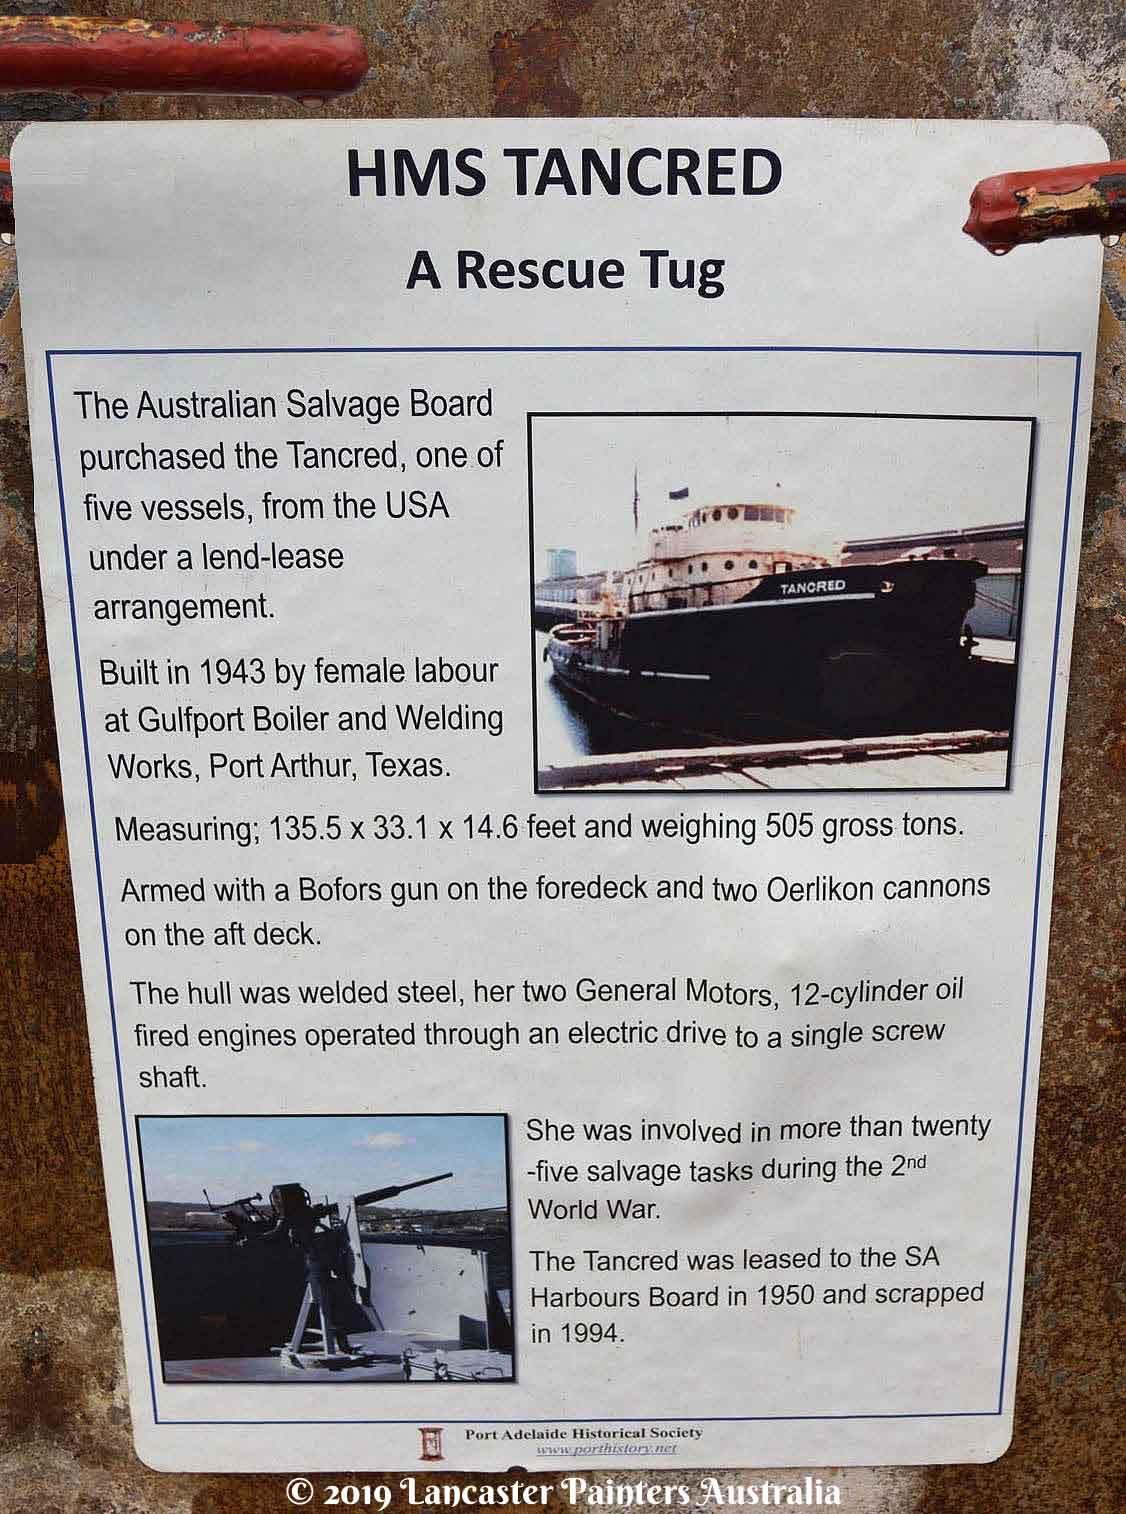 HMS Tancred